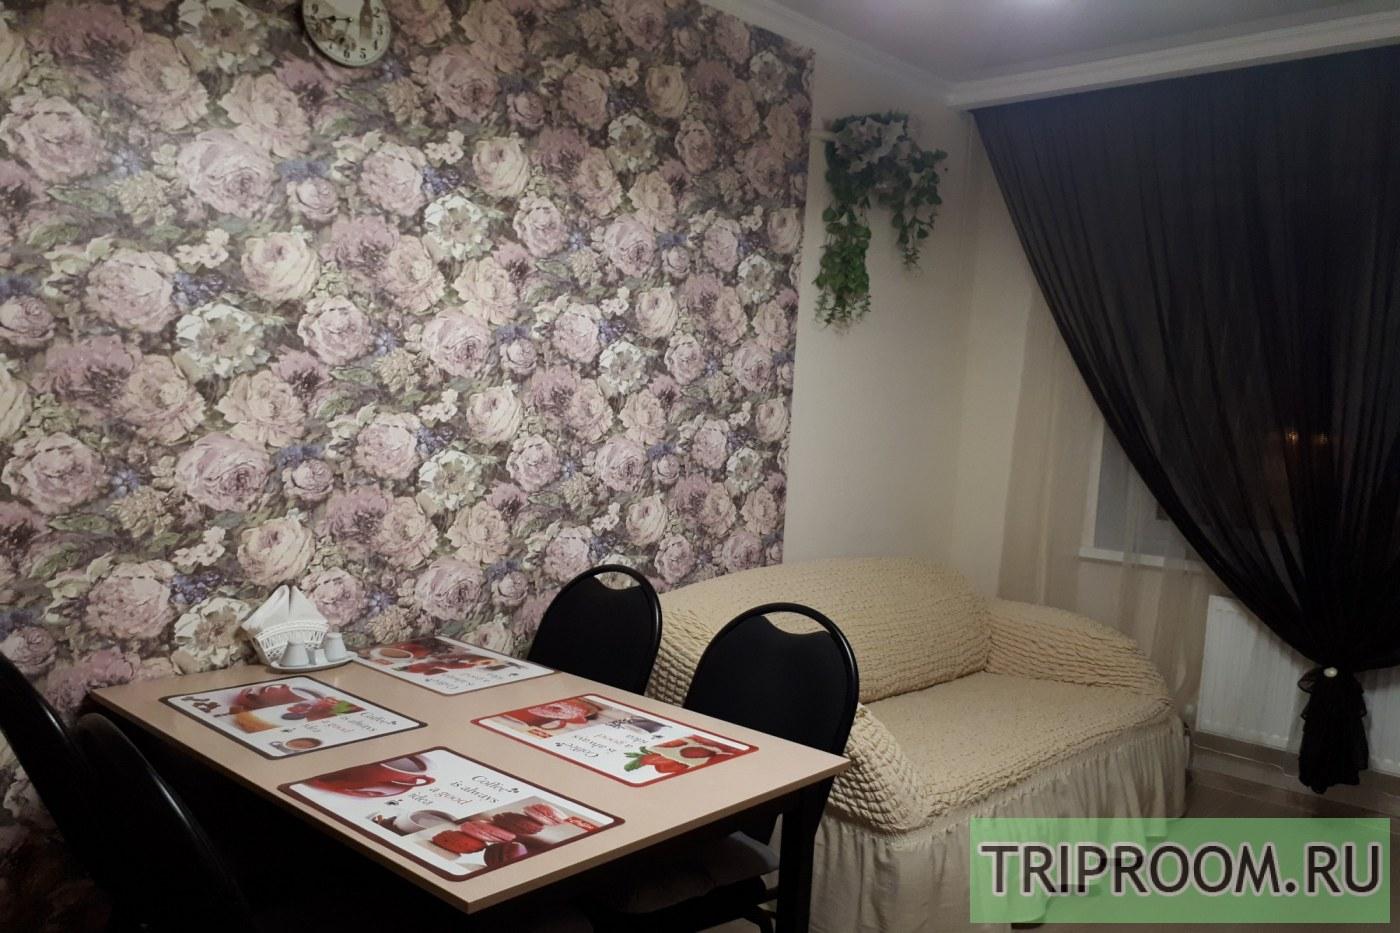 1-комнатная квартира посуточно (вариант № 39060), ул. Симиренко улица, фото № 6